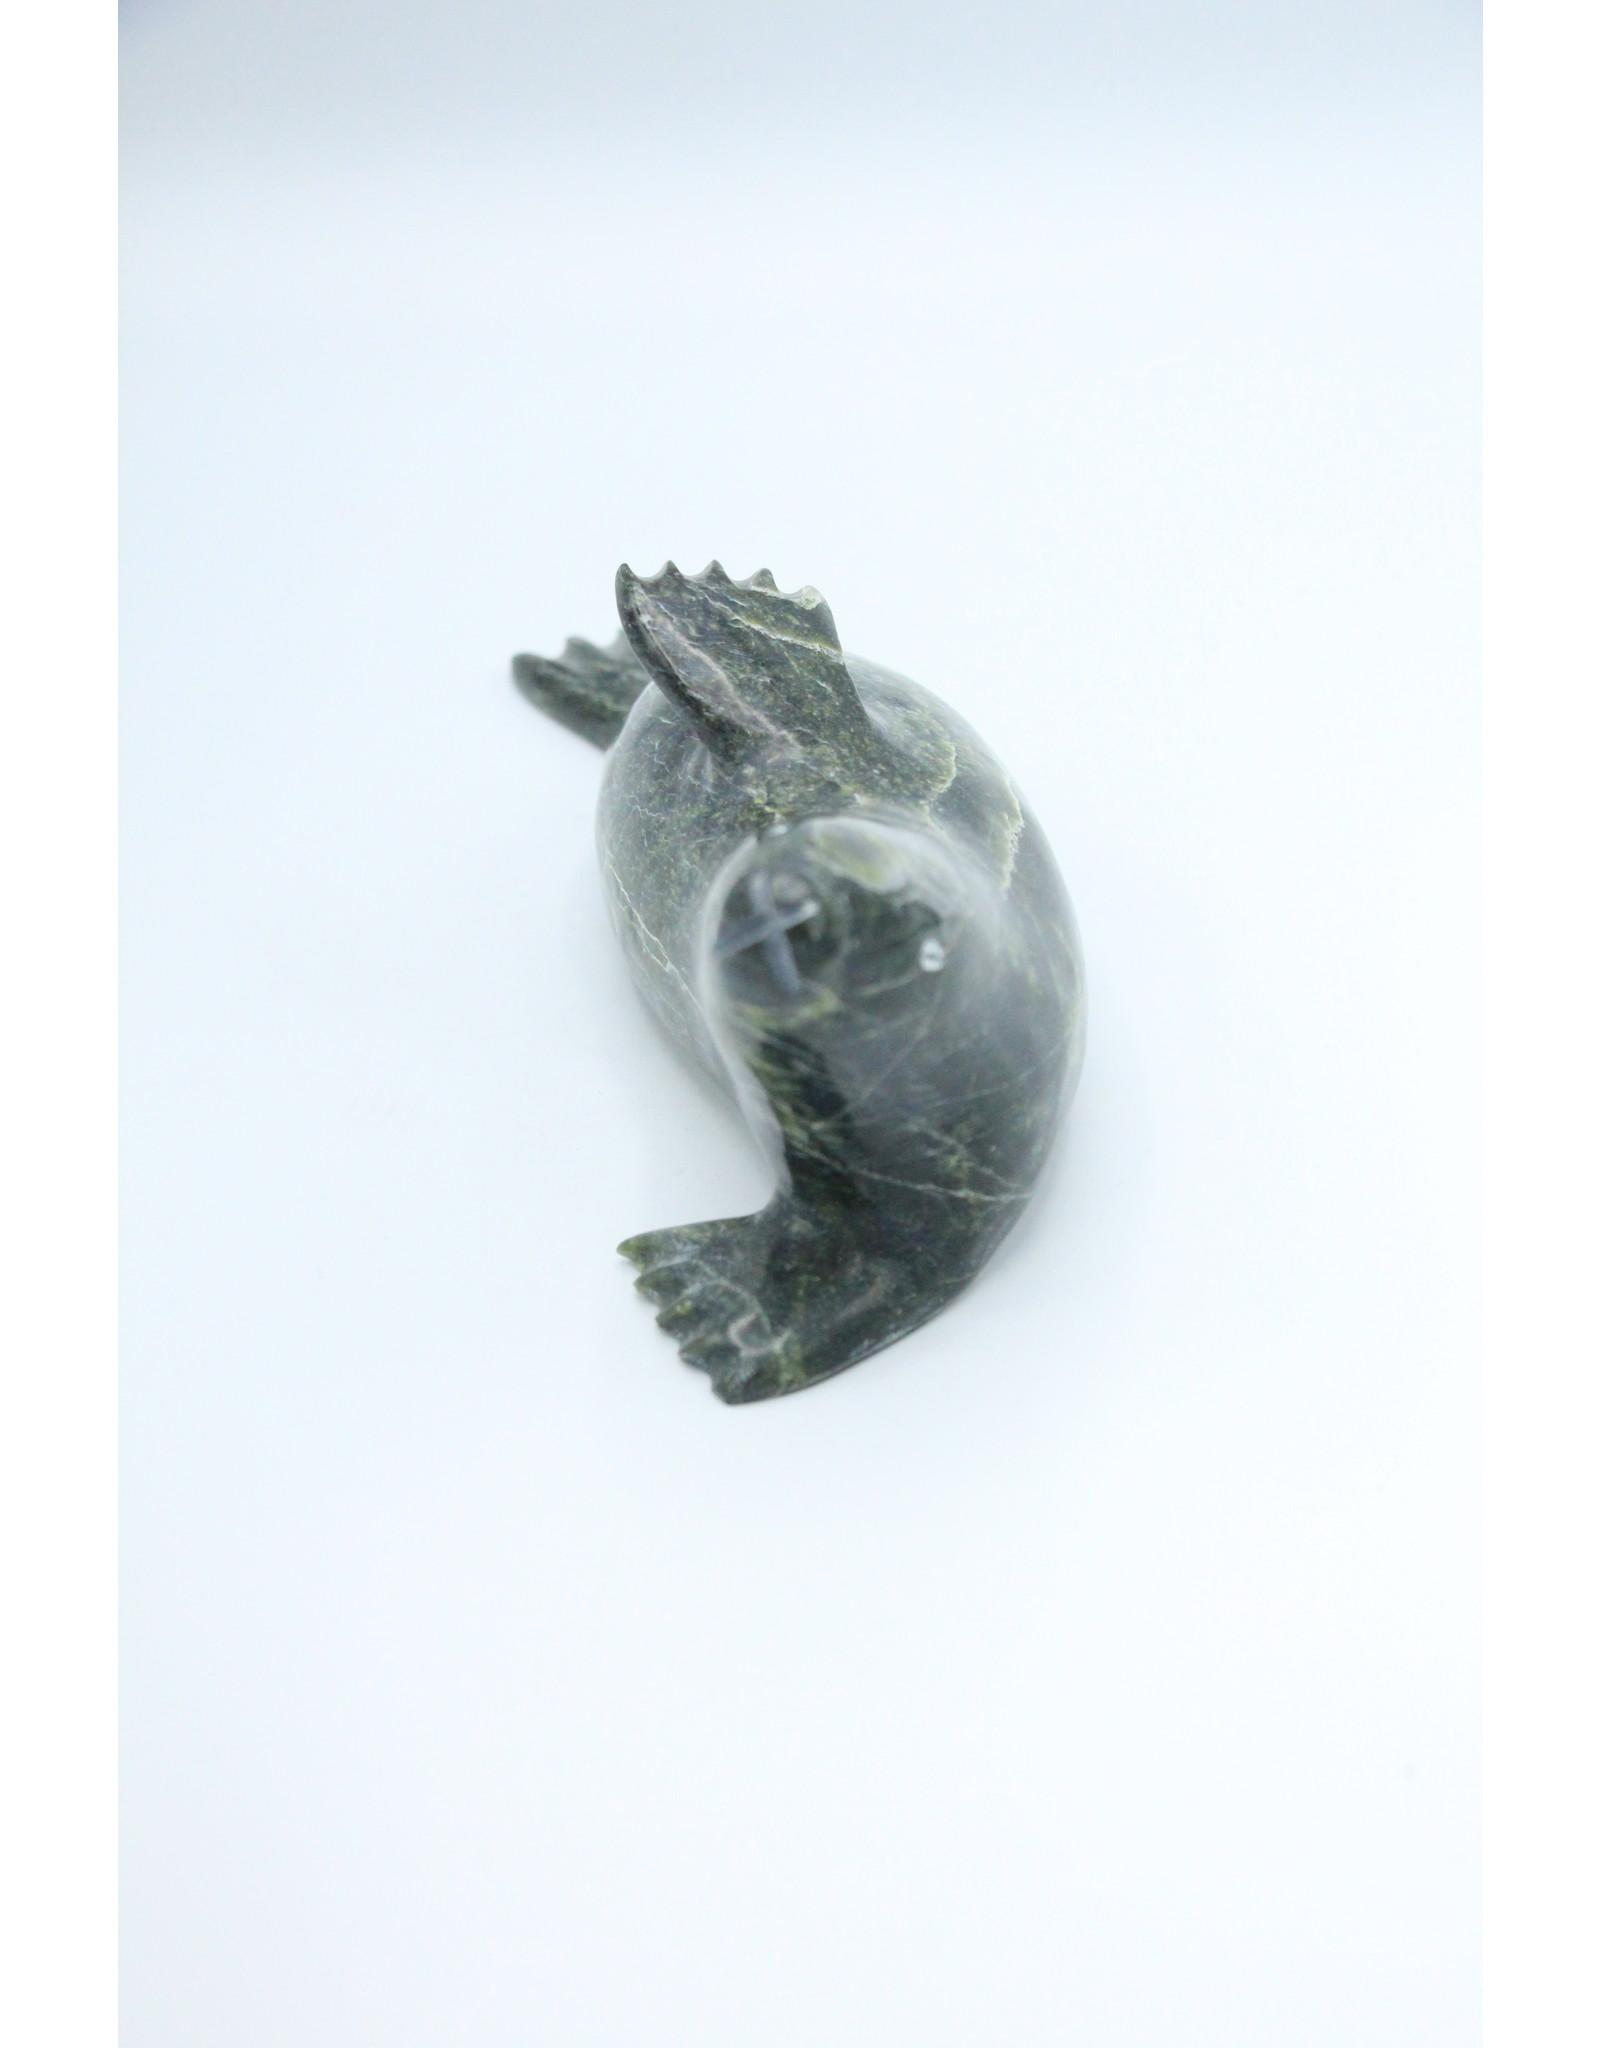 59622 Seal by Ning Ashoona